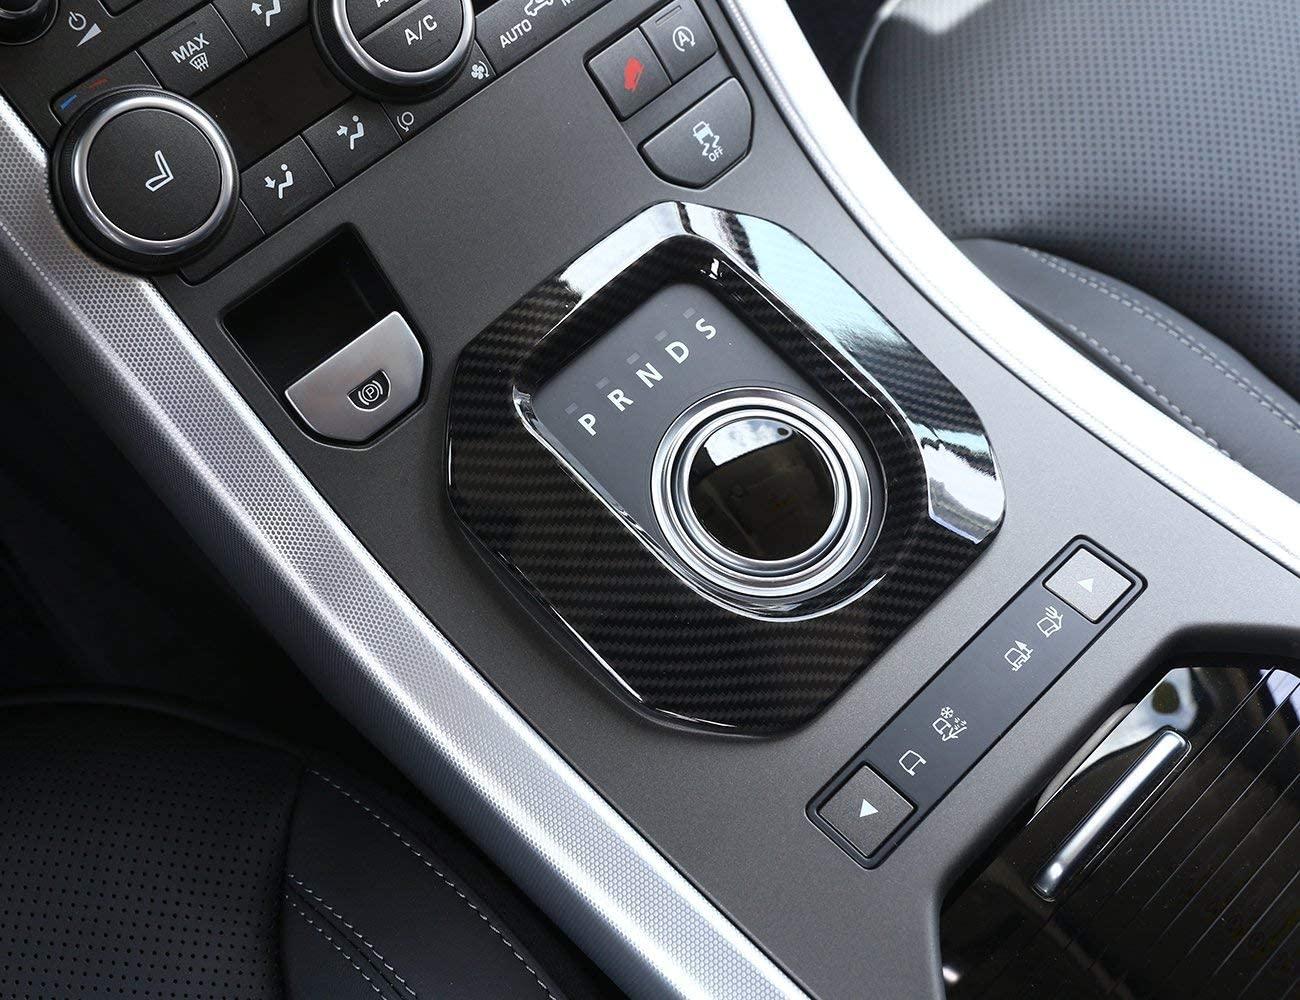 LLKUANG ABS Center Console Matte Gear Shift Panel Cover Trim for Land Rover Range Rover Evoque 2014-2018 (Carbon Fiber)